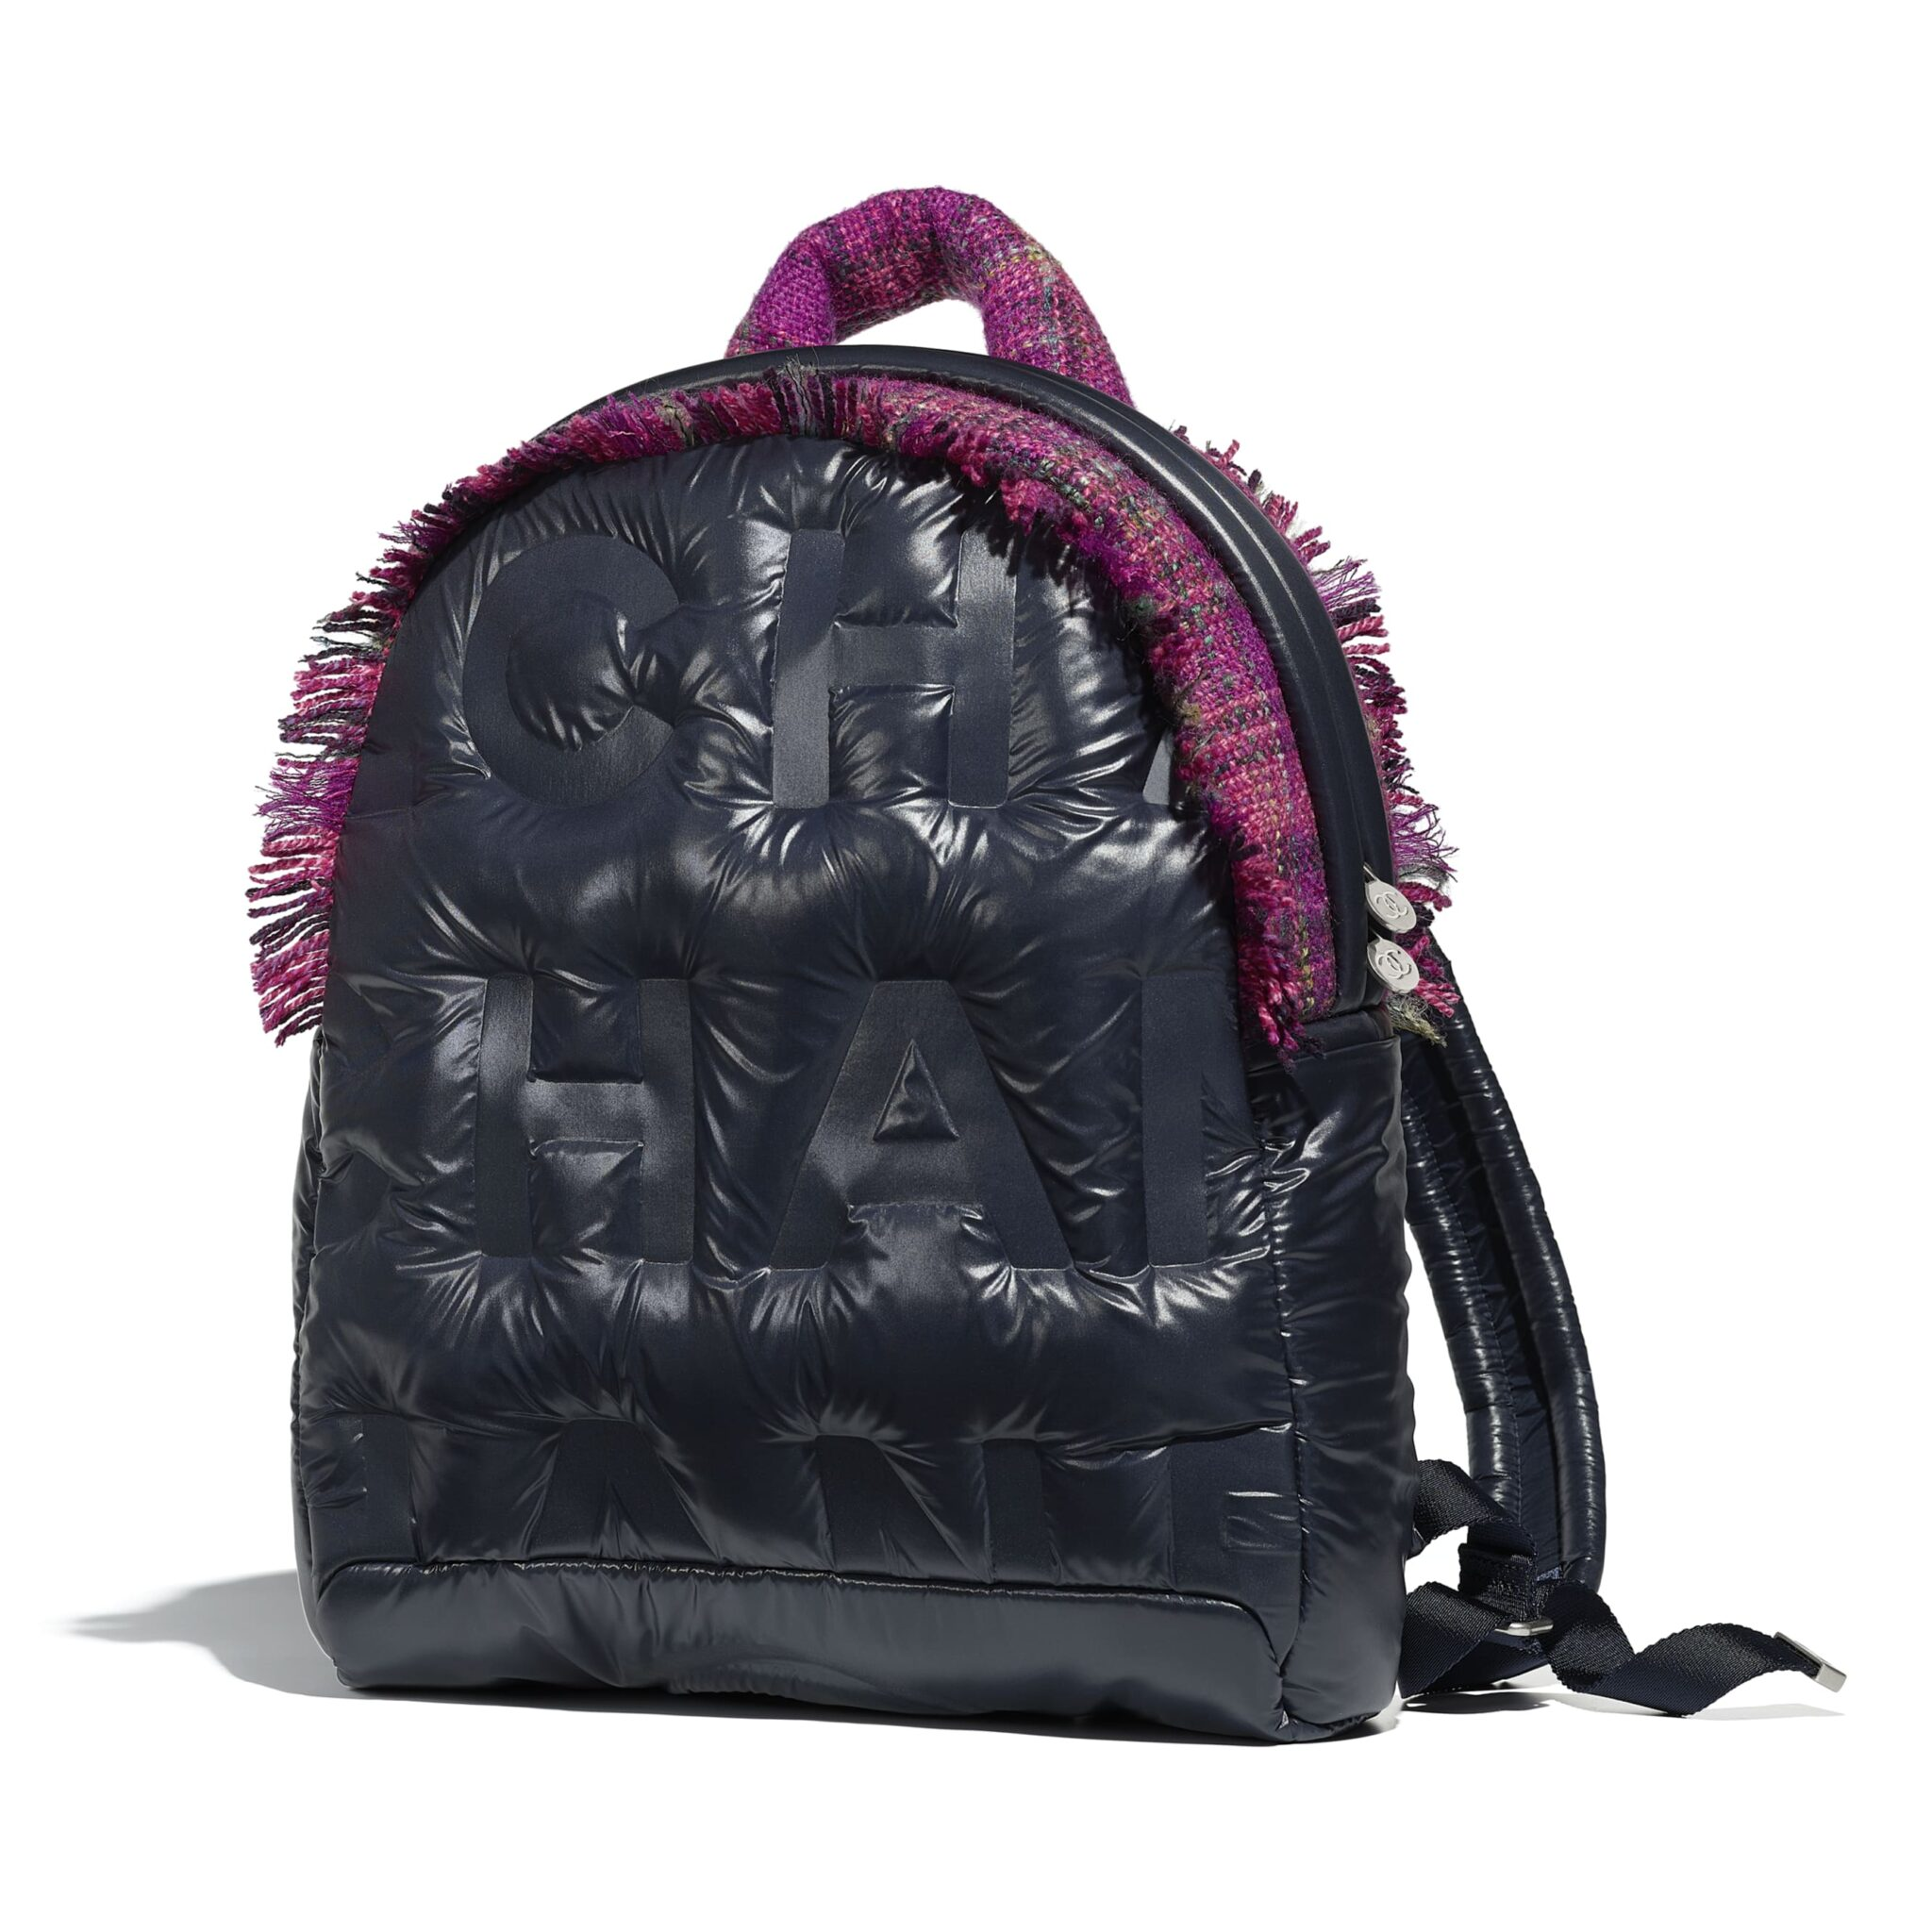 d4fe094eef61 Chanel Navy Blue/Fuchsia Nylon/Tweed Coco Neige Backpack Bag